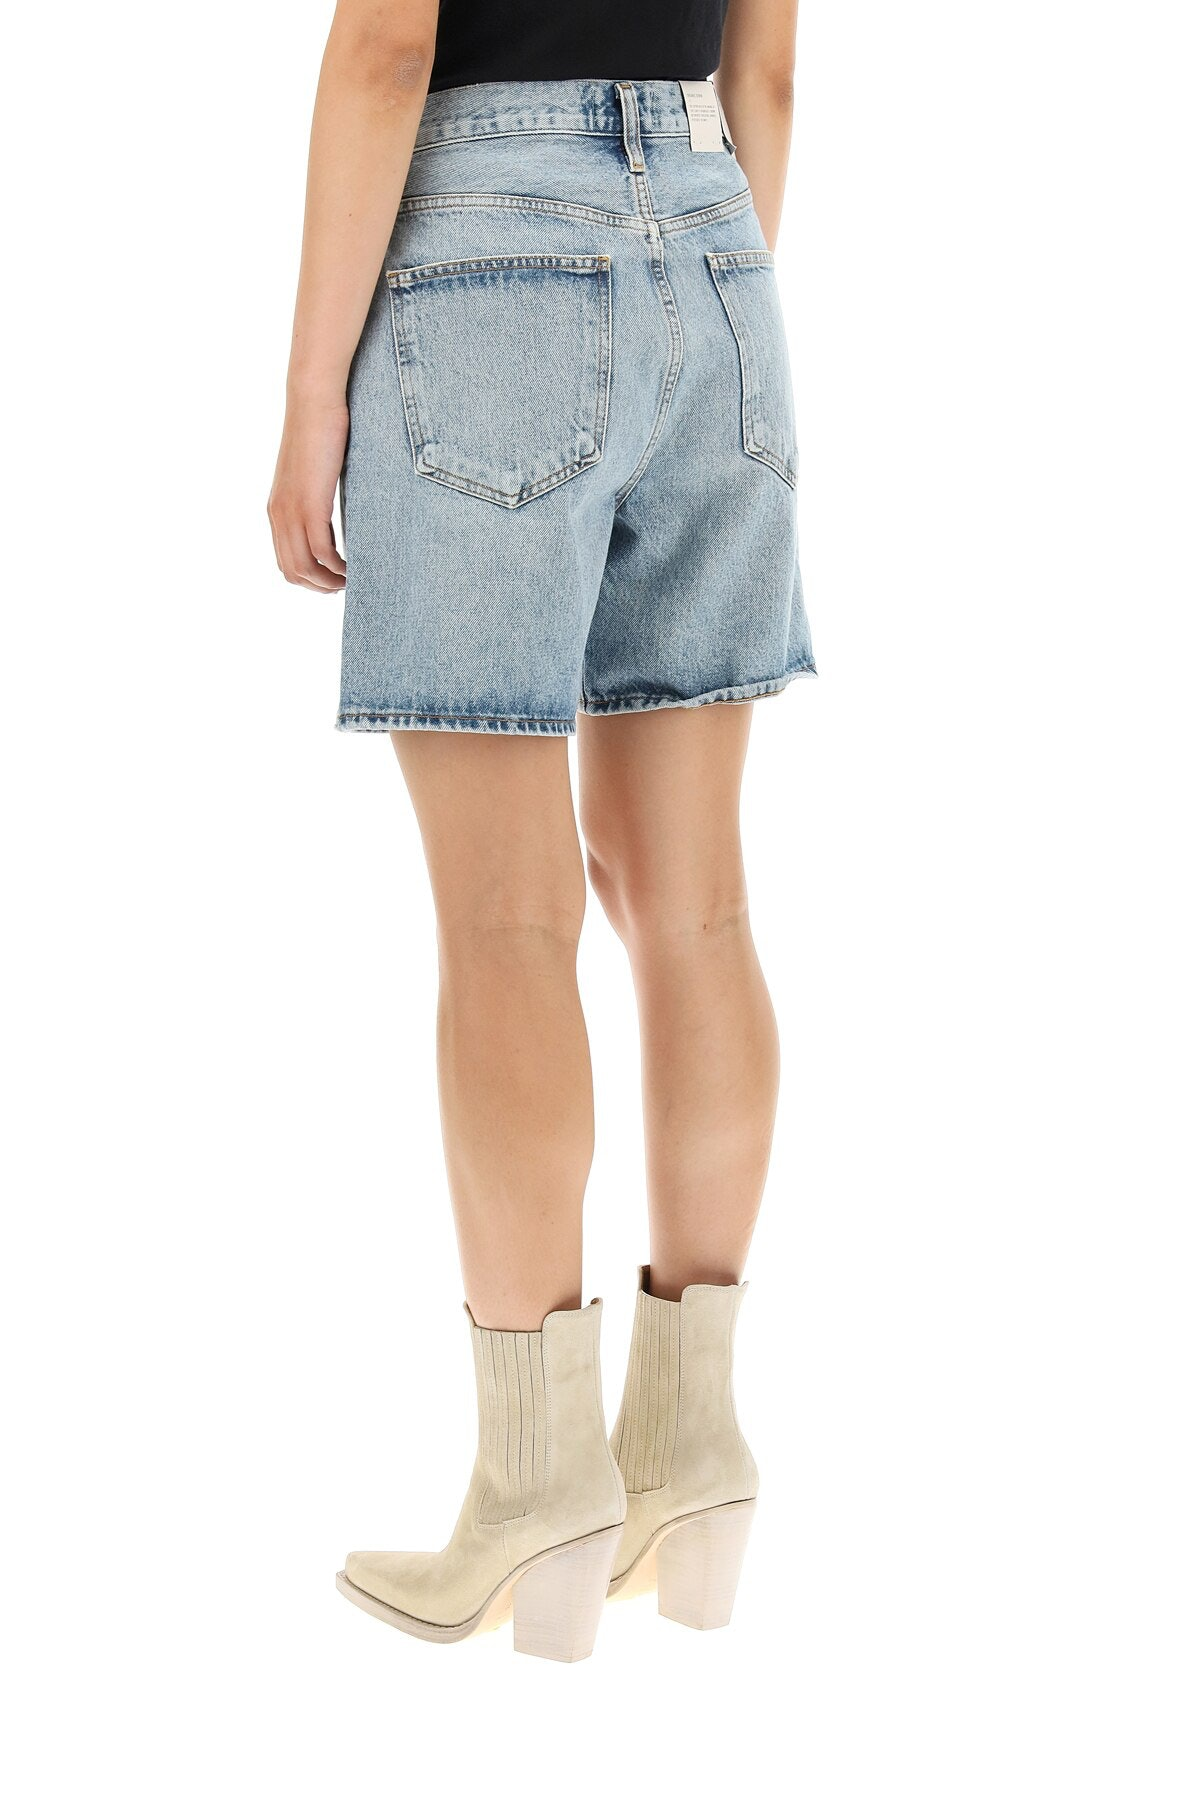 Agolde Criss Cross Denim Shorts: additional image